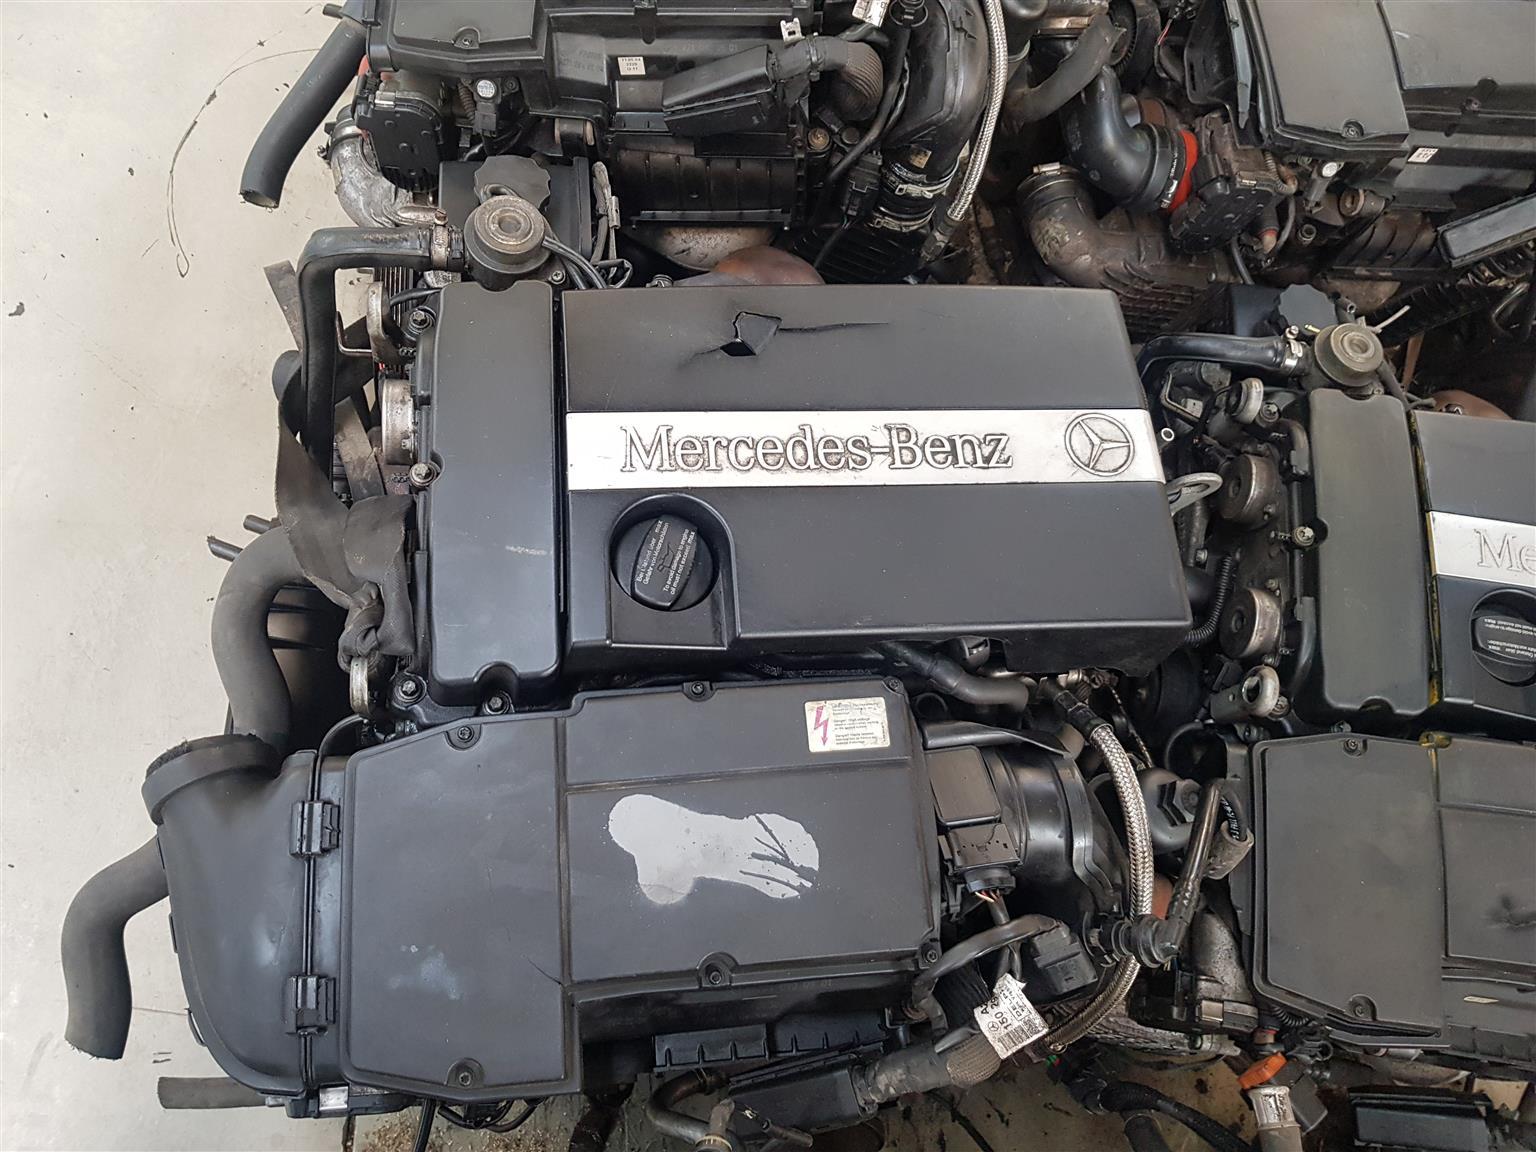 MERCEDES BENZ C200 C180 KOMPRESSOR ENGINE (271)